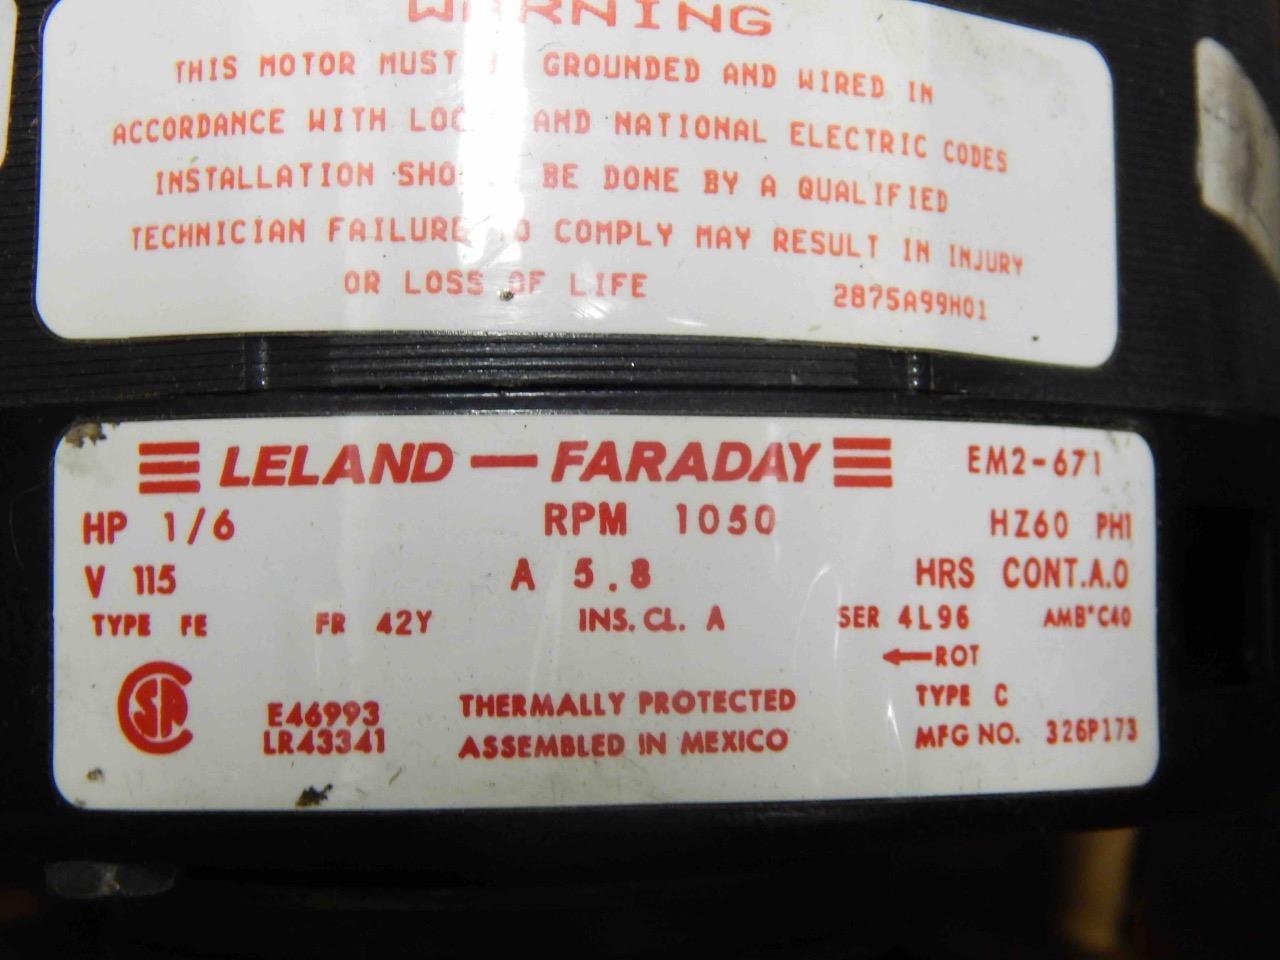 Leland Faraday Motor Wiring Diagram Schematics Bodine Explained Diagrams